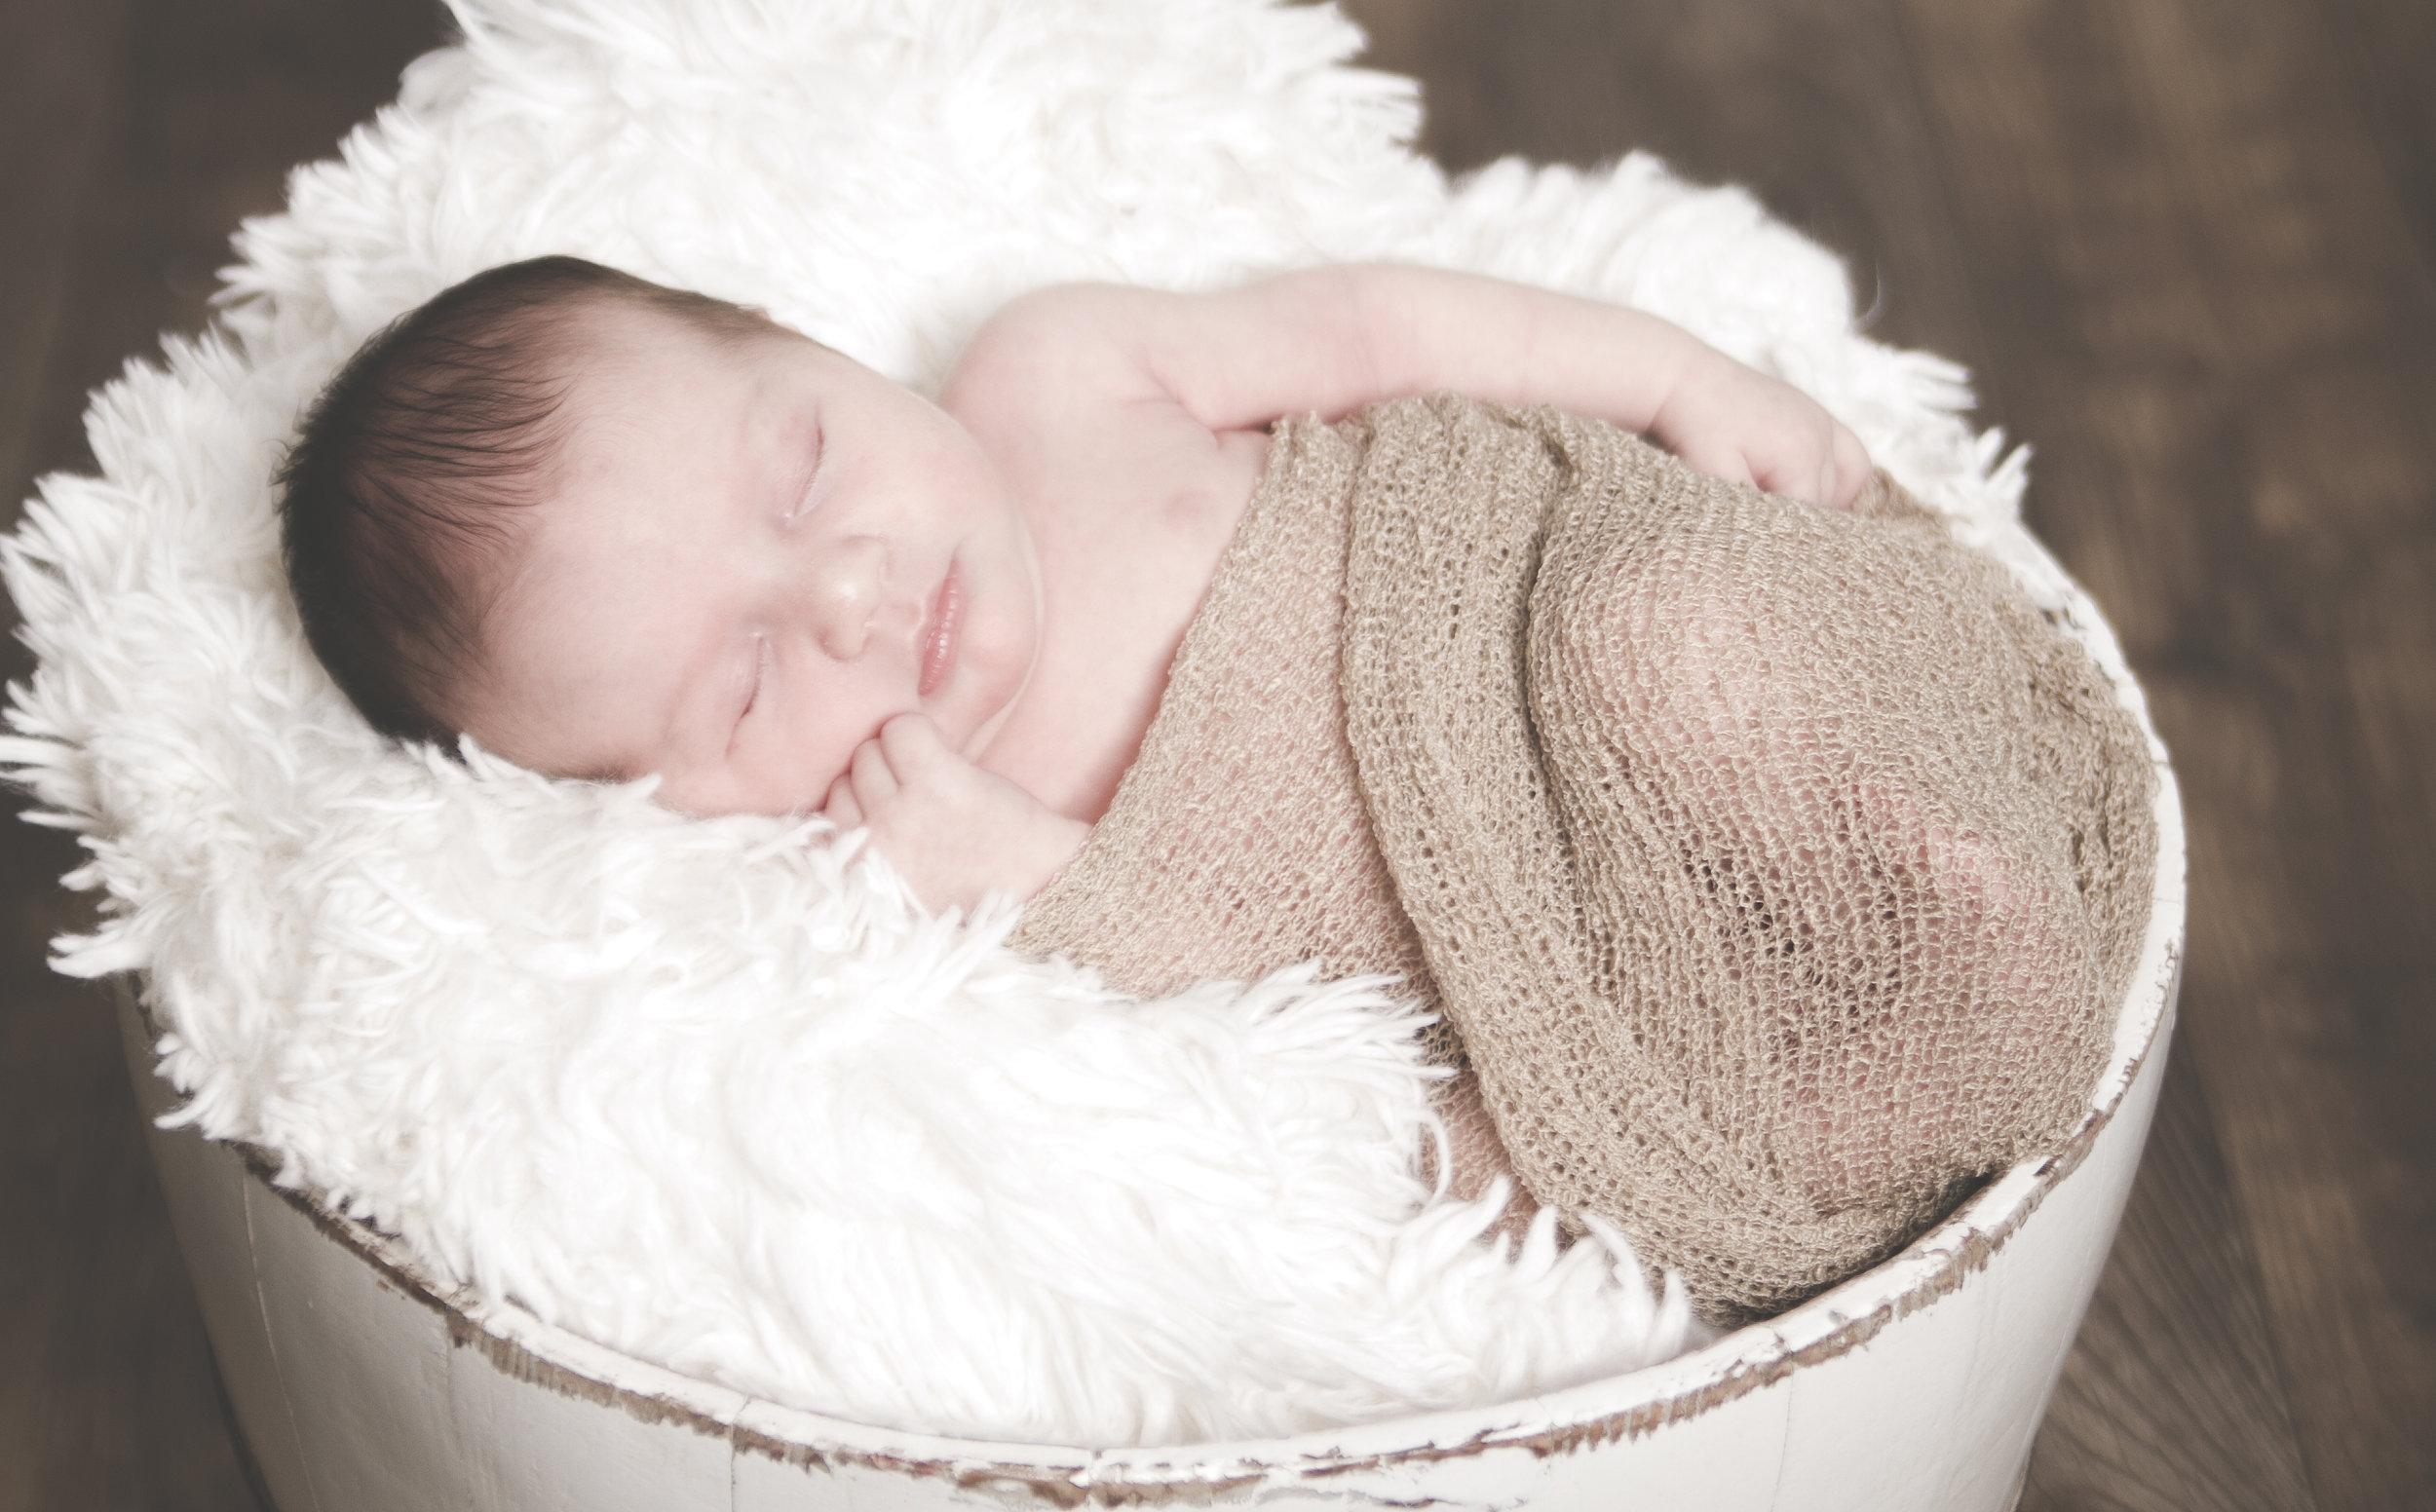 Baby Noah in blankets.jpg